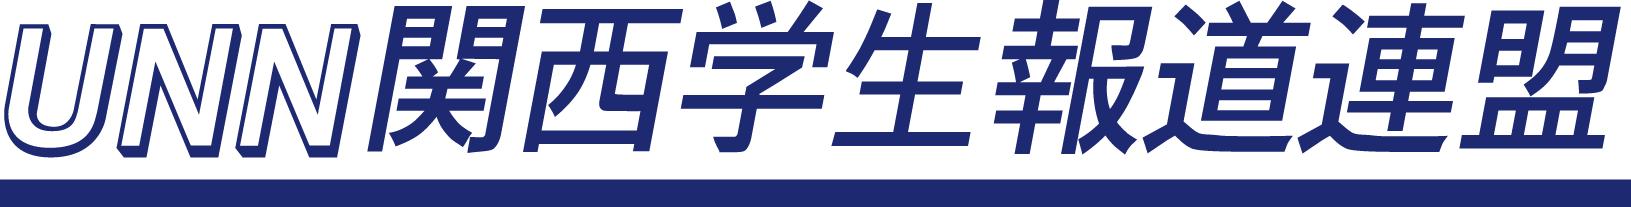 UNN関西学生報道連盟